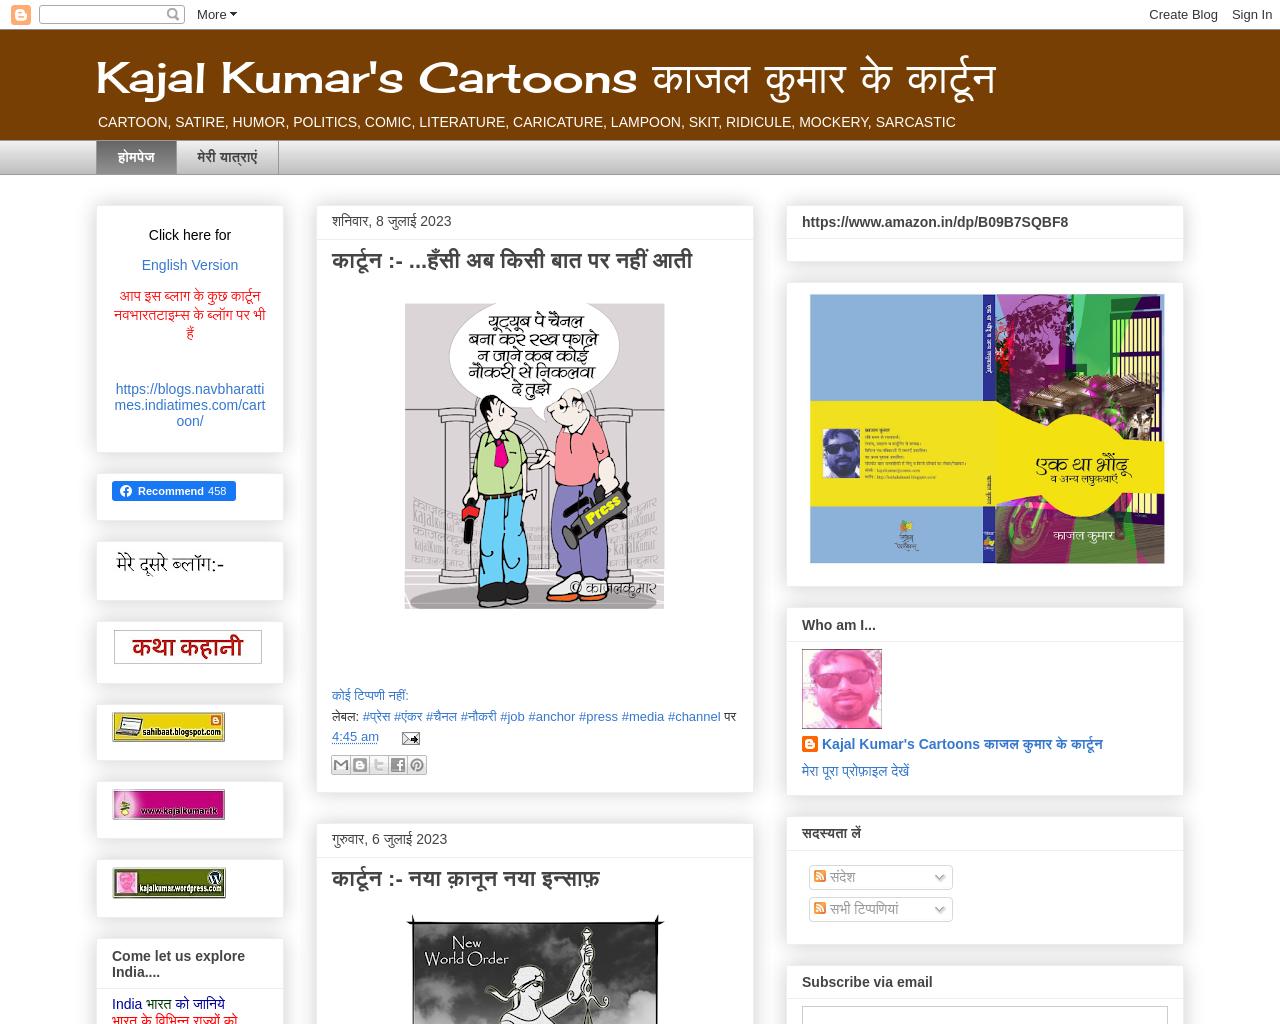 काजल कुमार के कार्टून Kajal Kumar's Cartoons